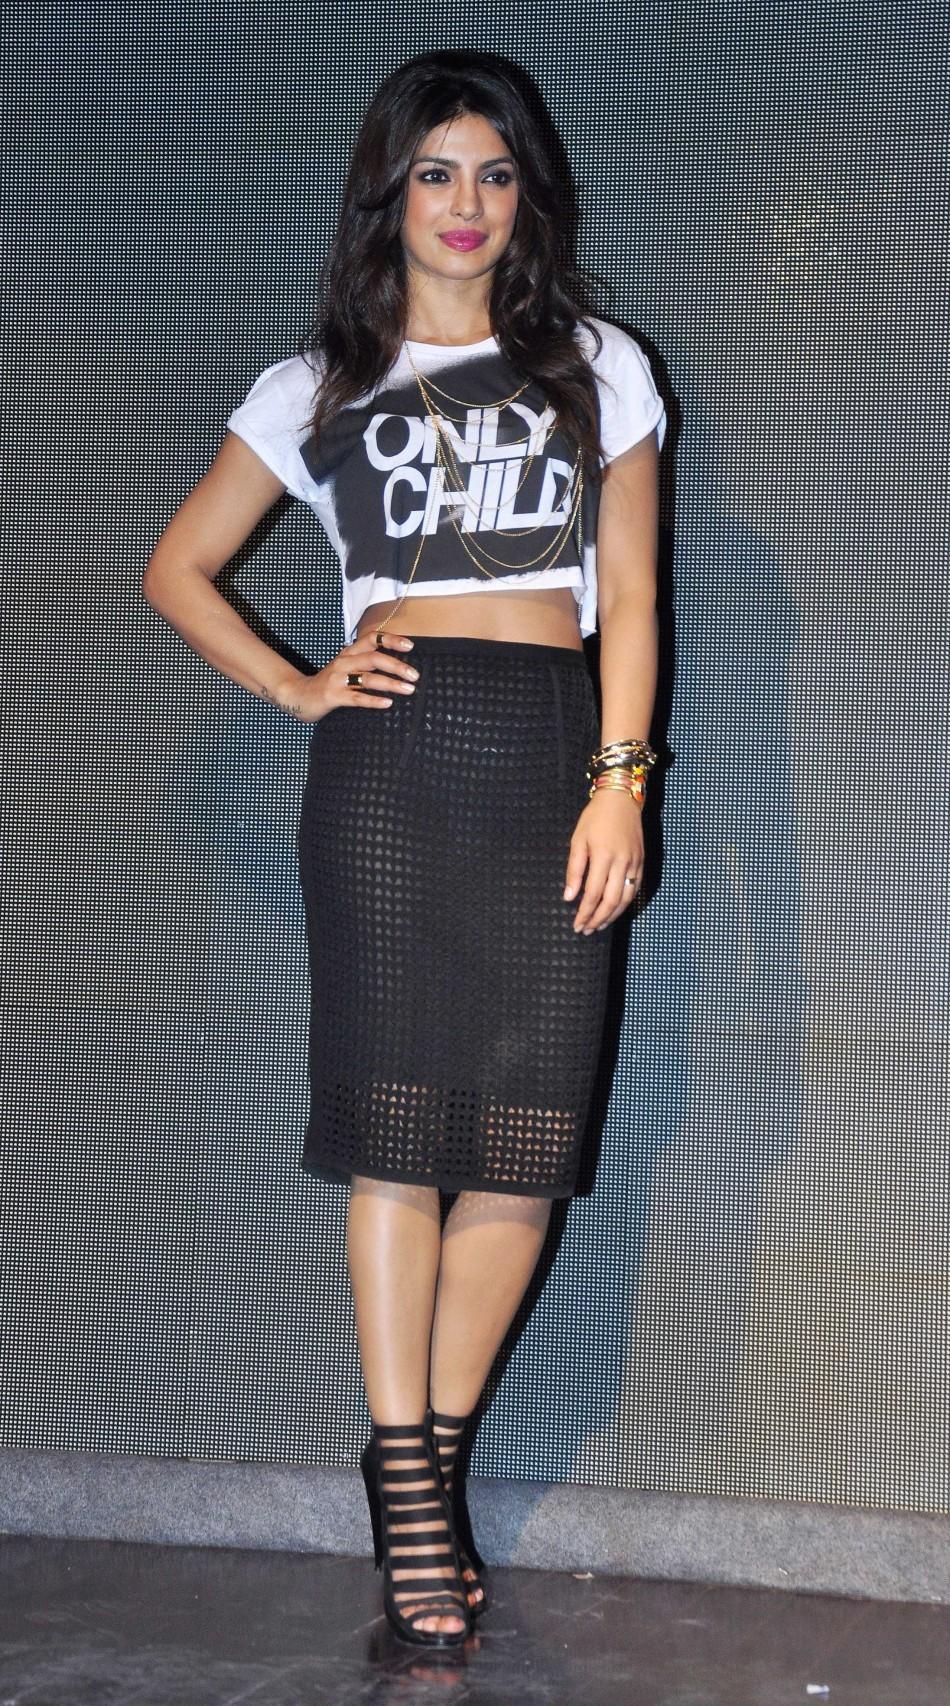 Priyanka Chopra partnered with Nokia Mix Radio launches her latest single